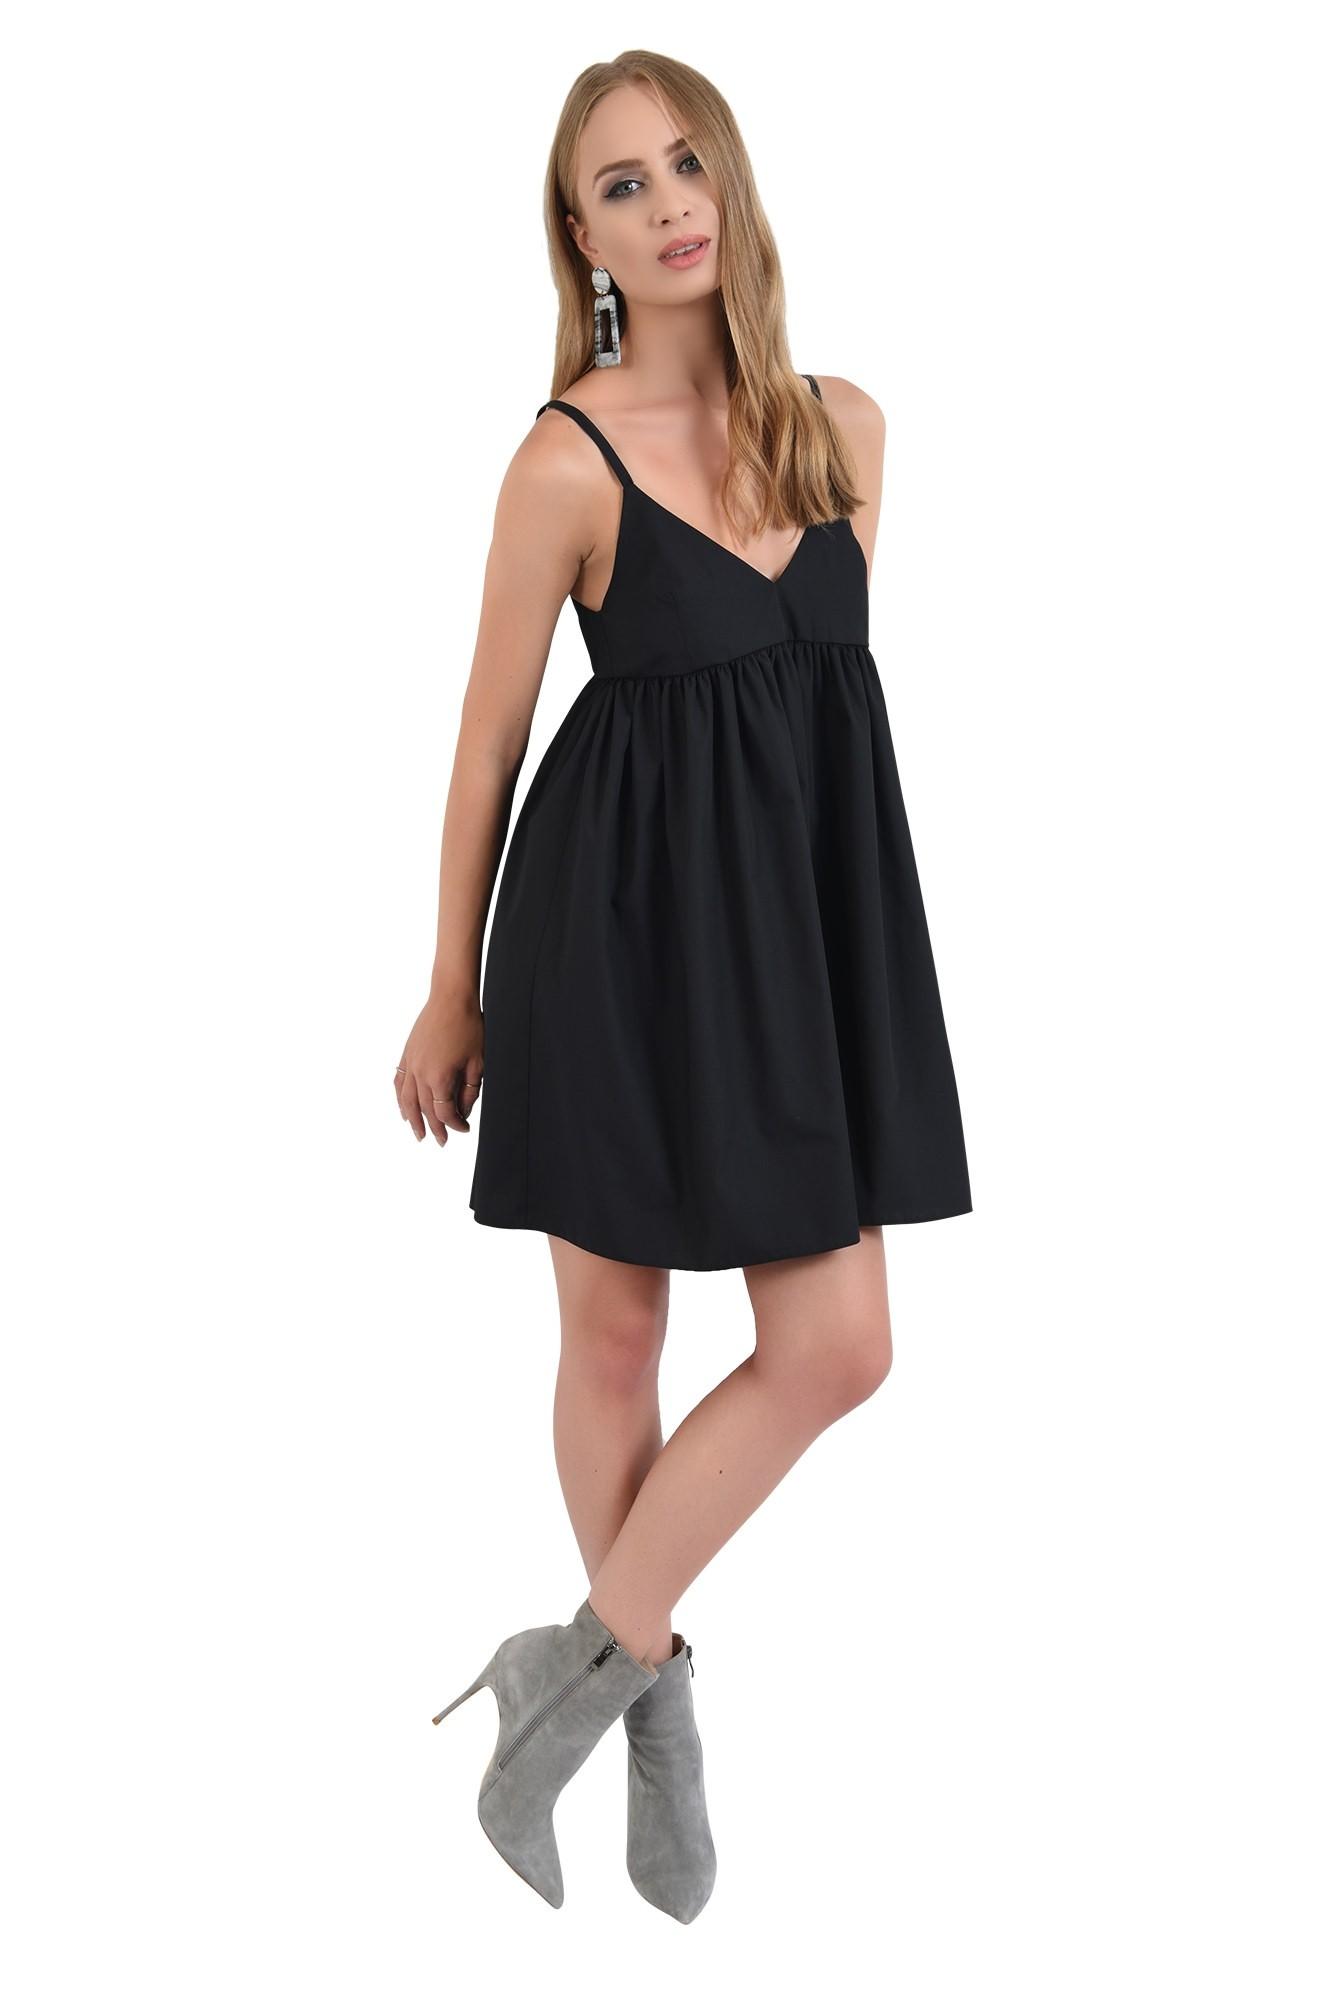 360 - rochie neagra, mini, evazata, cu bretele, anchior